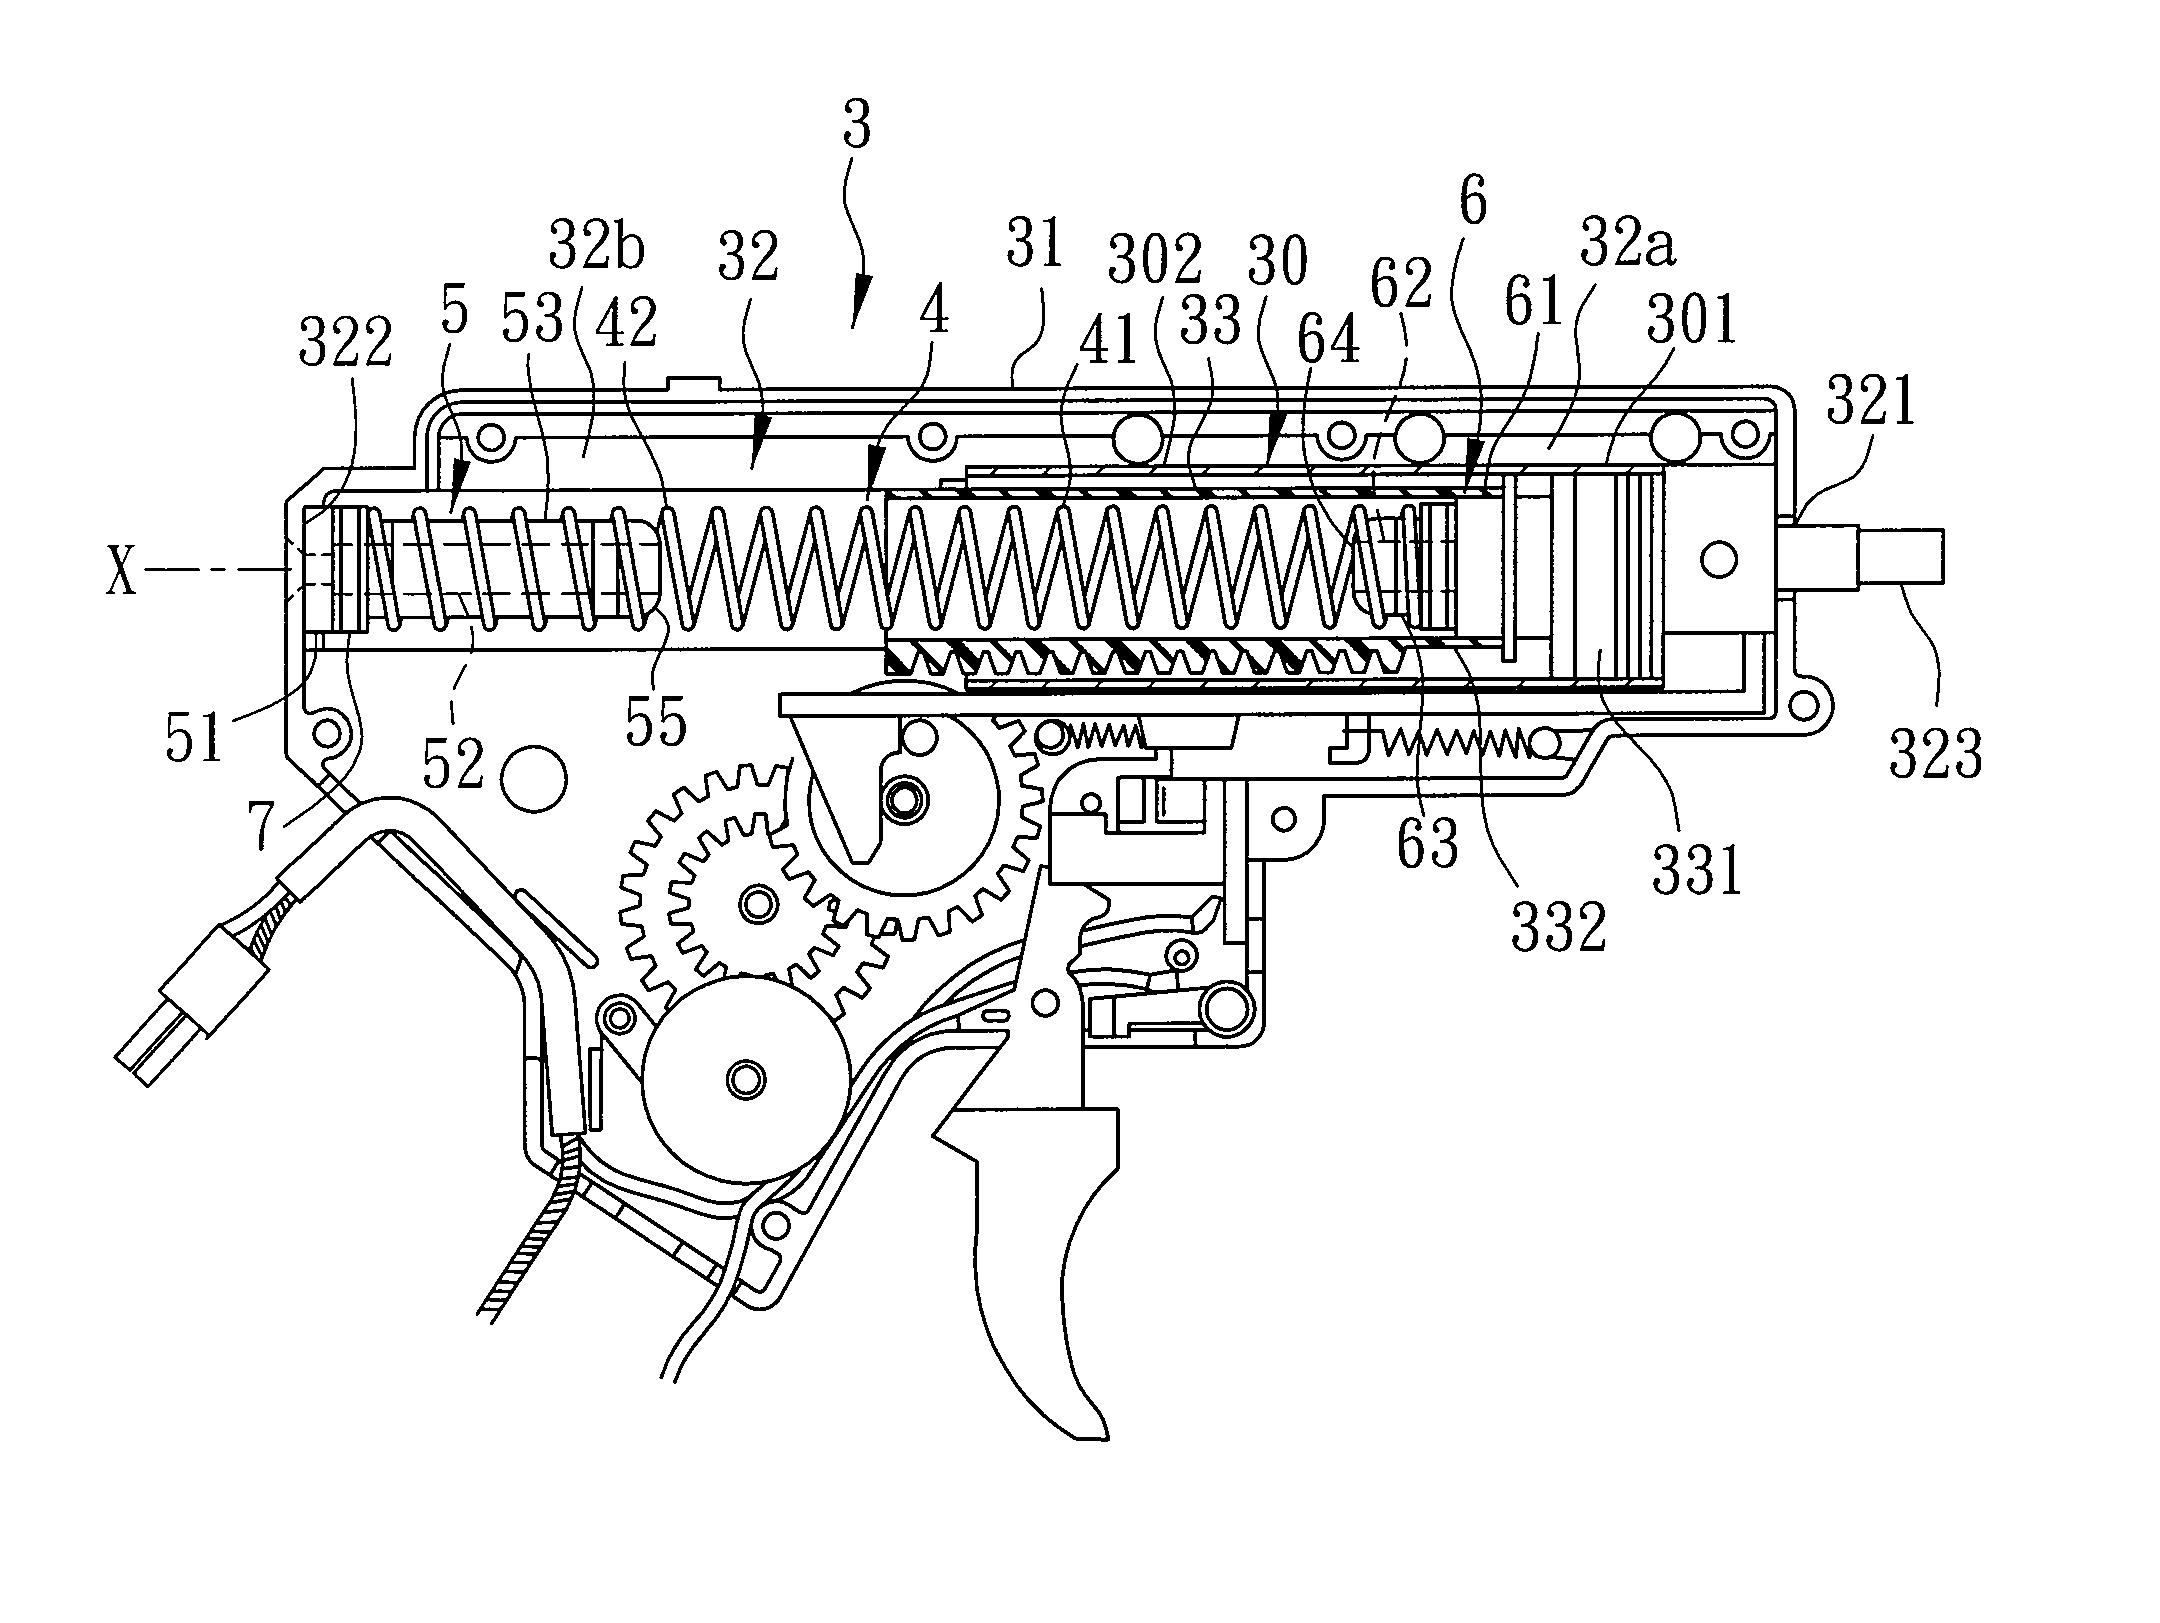 Patent Us8453633 - Spring-piston Airsoft Gun